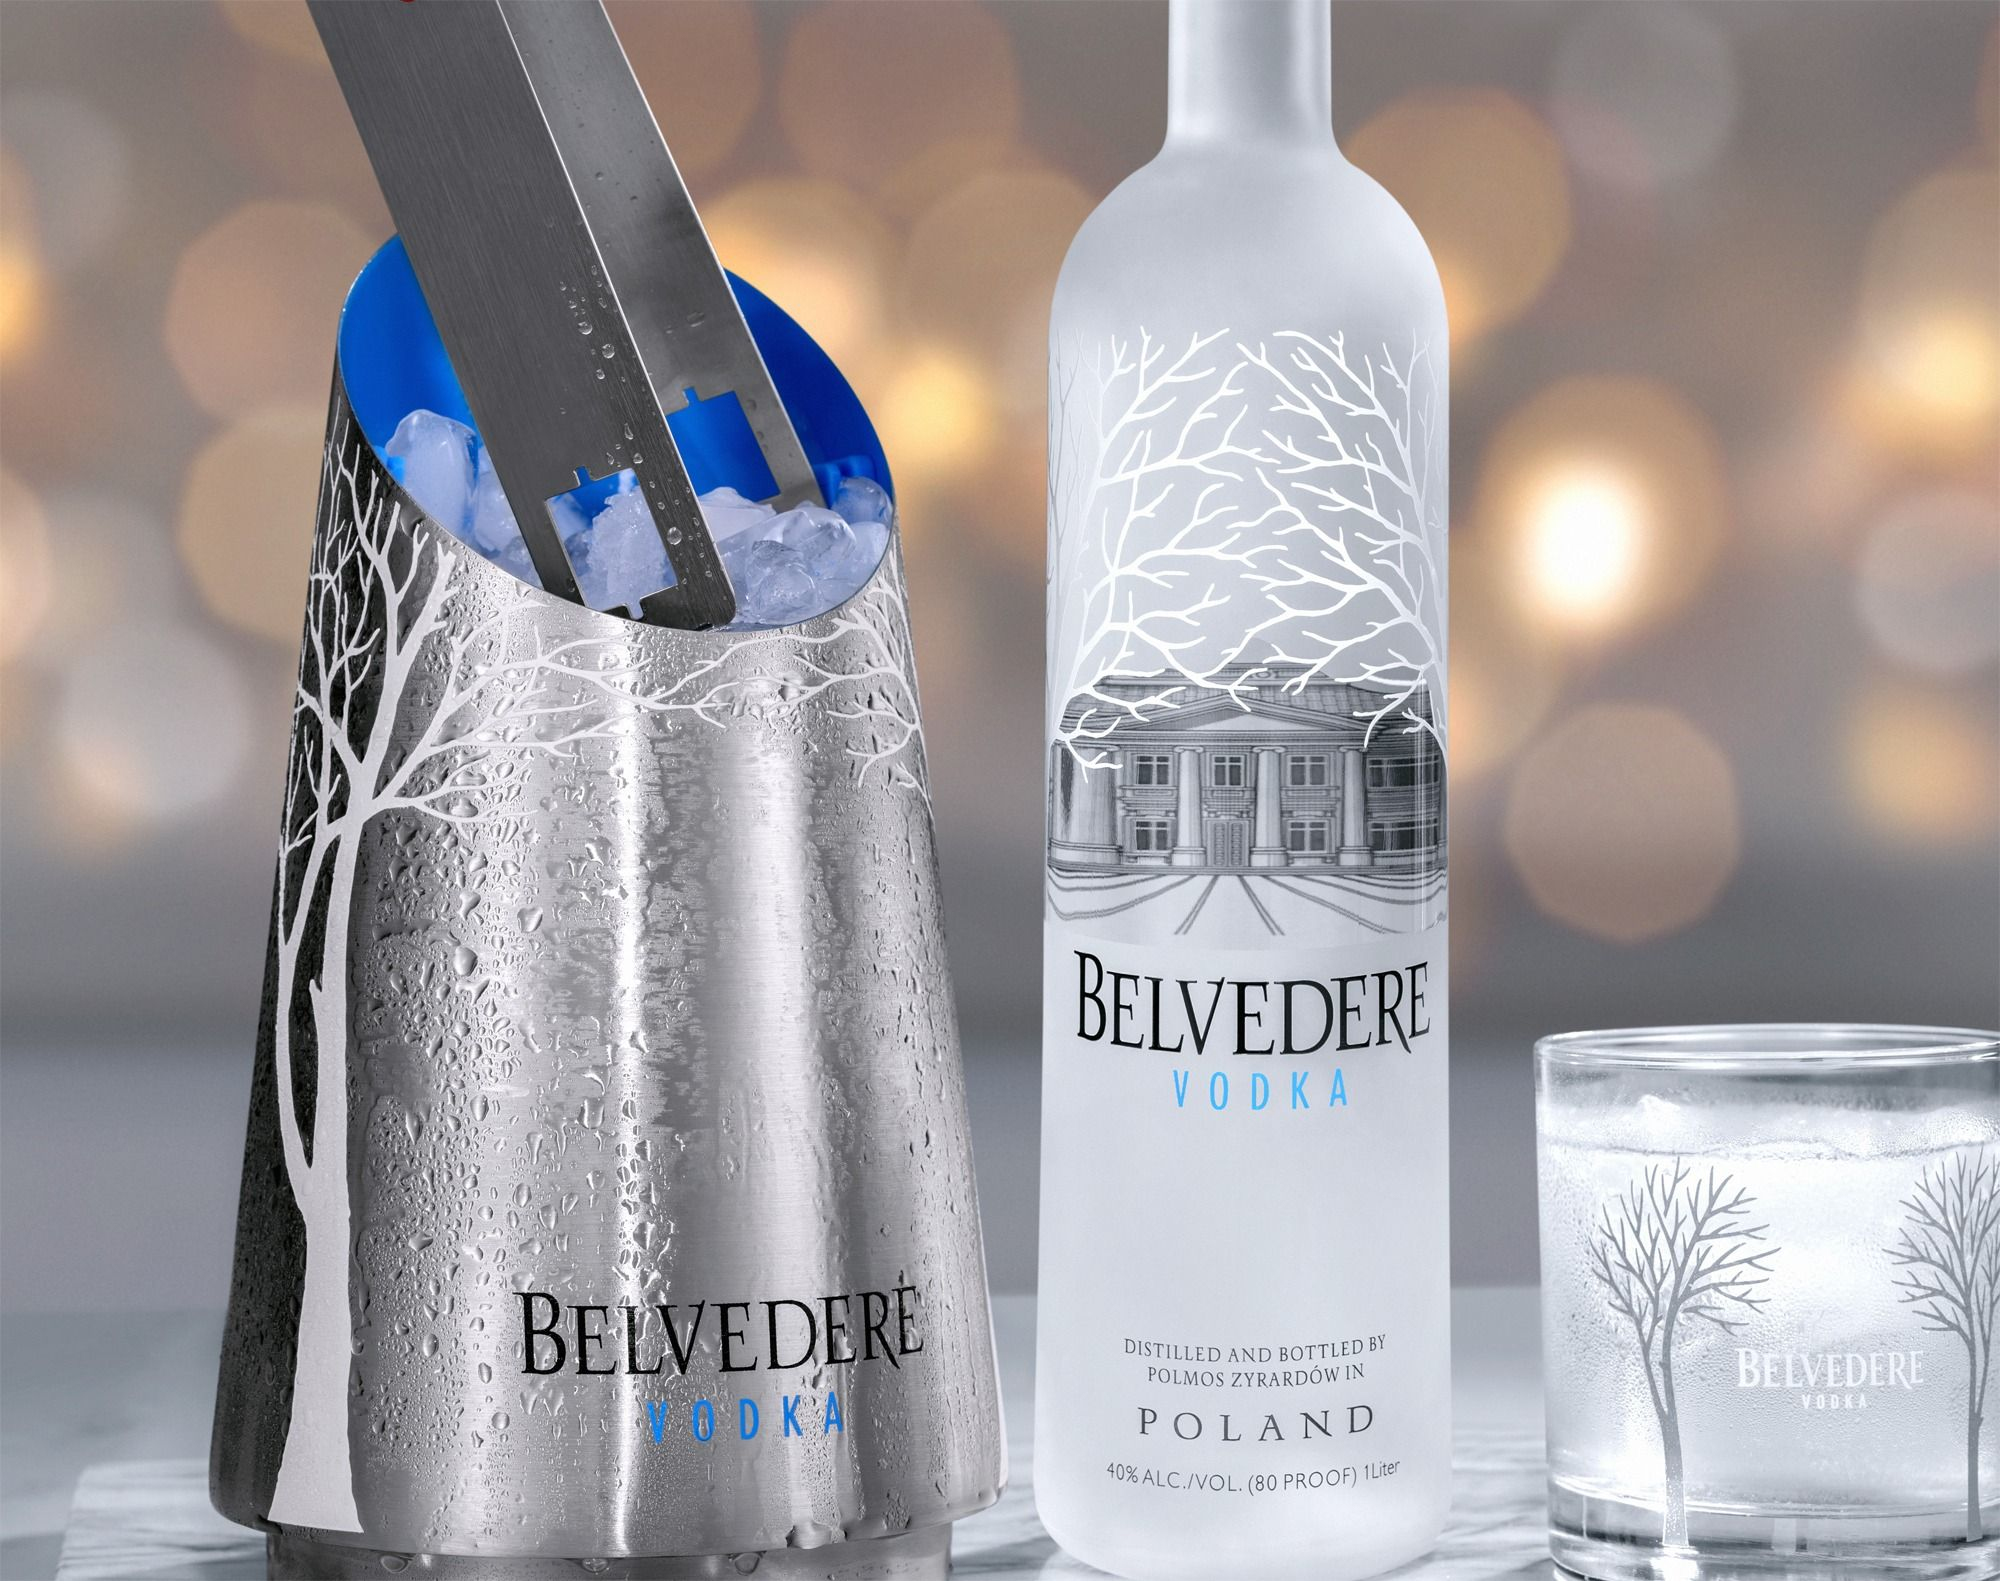 Belvedere Vodka Celebrates Its New Kosher Status